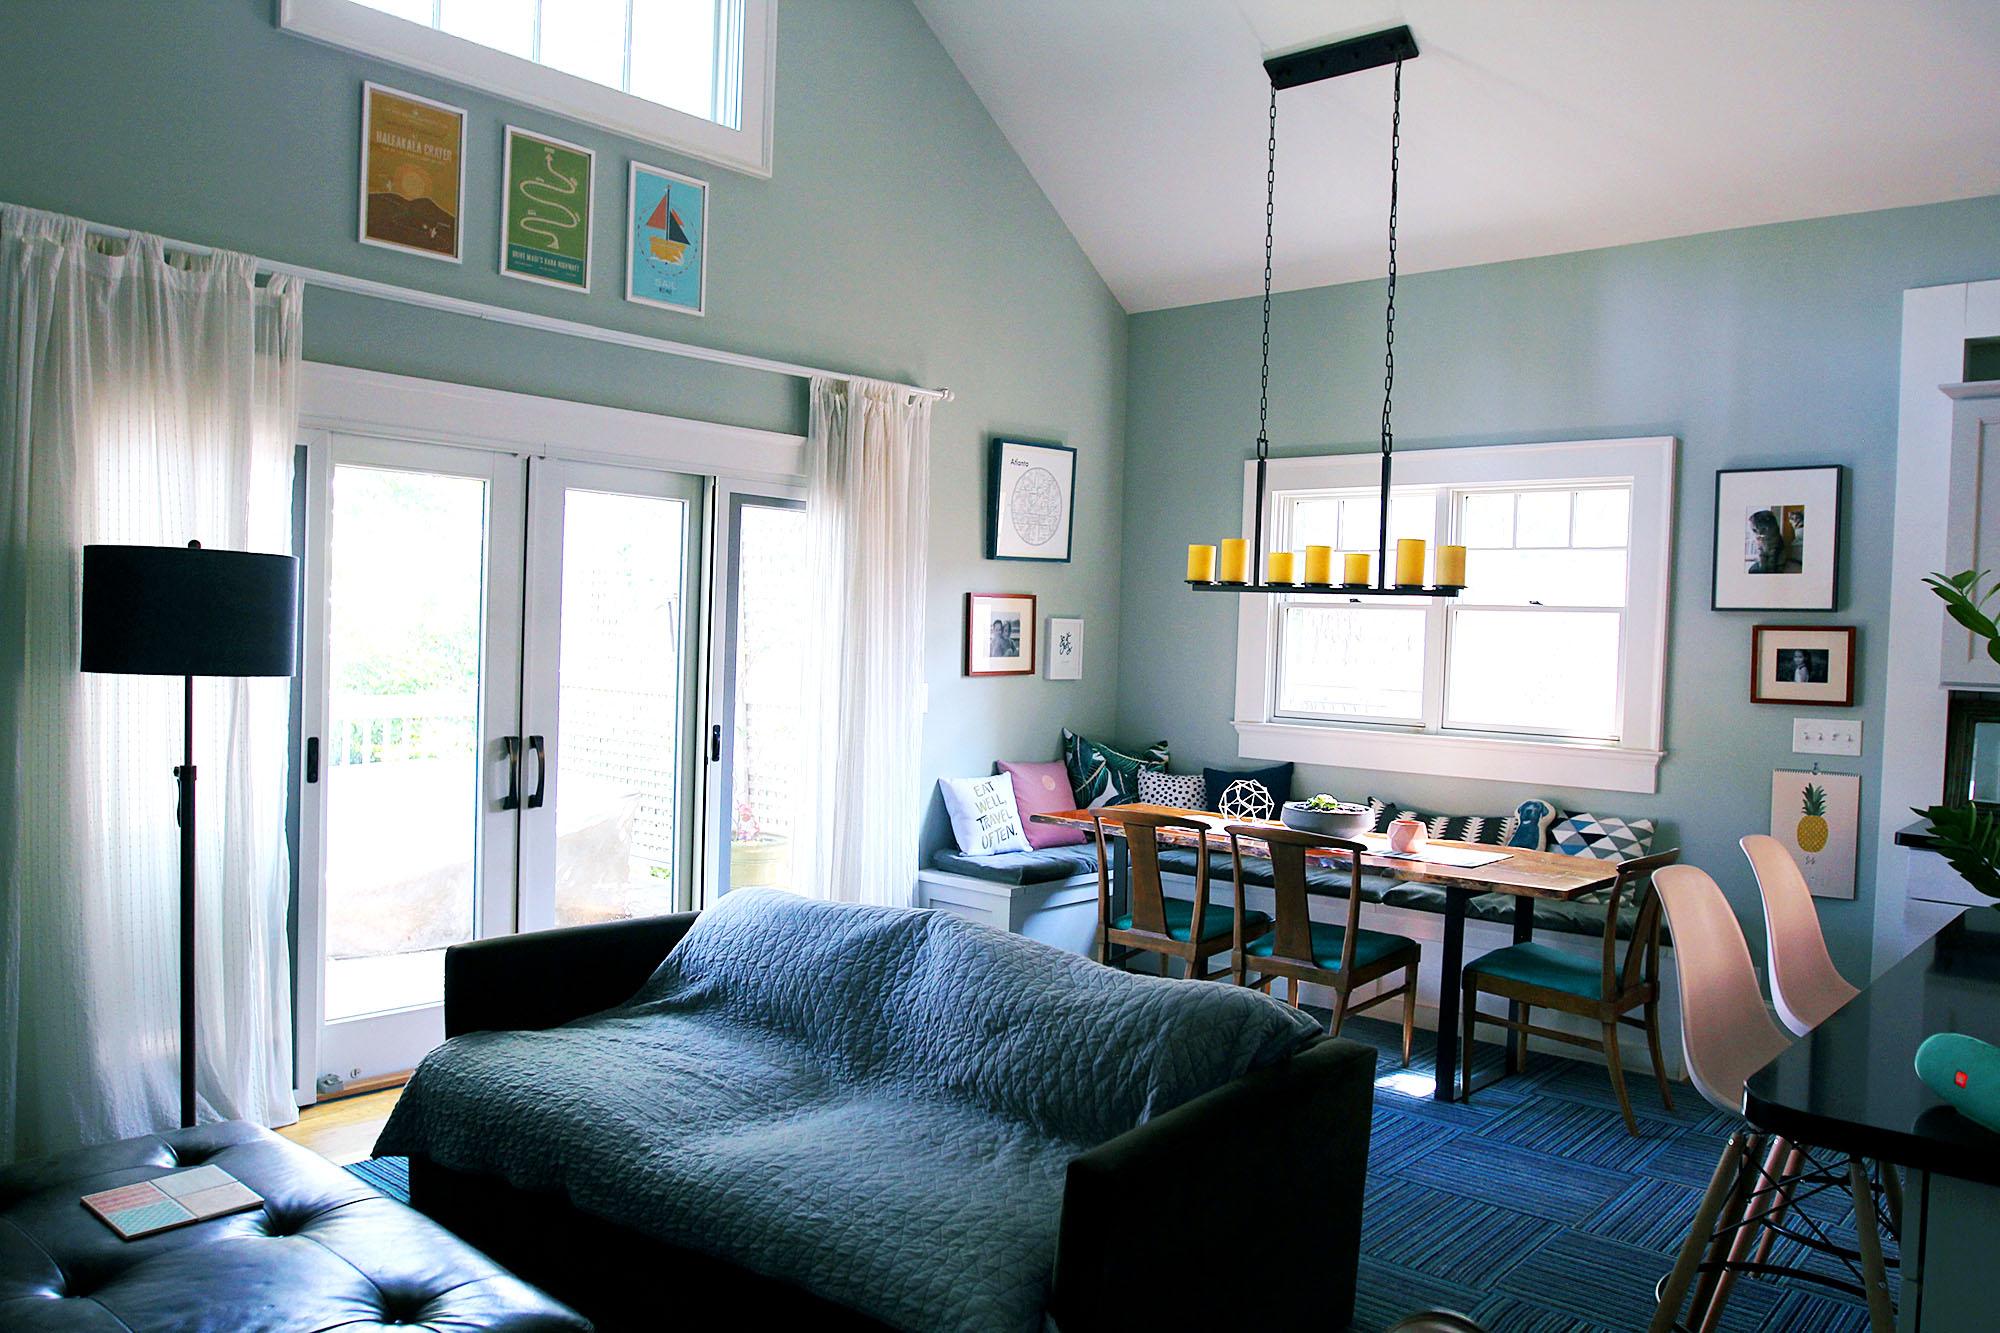 jo-torrijos-a-simpler-design-atlanta-modern-great-room-5.jpg